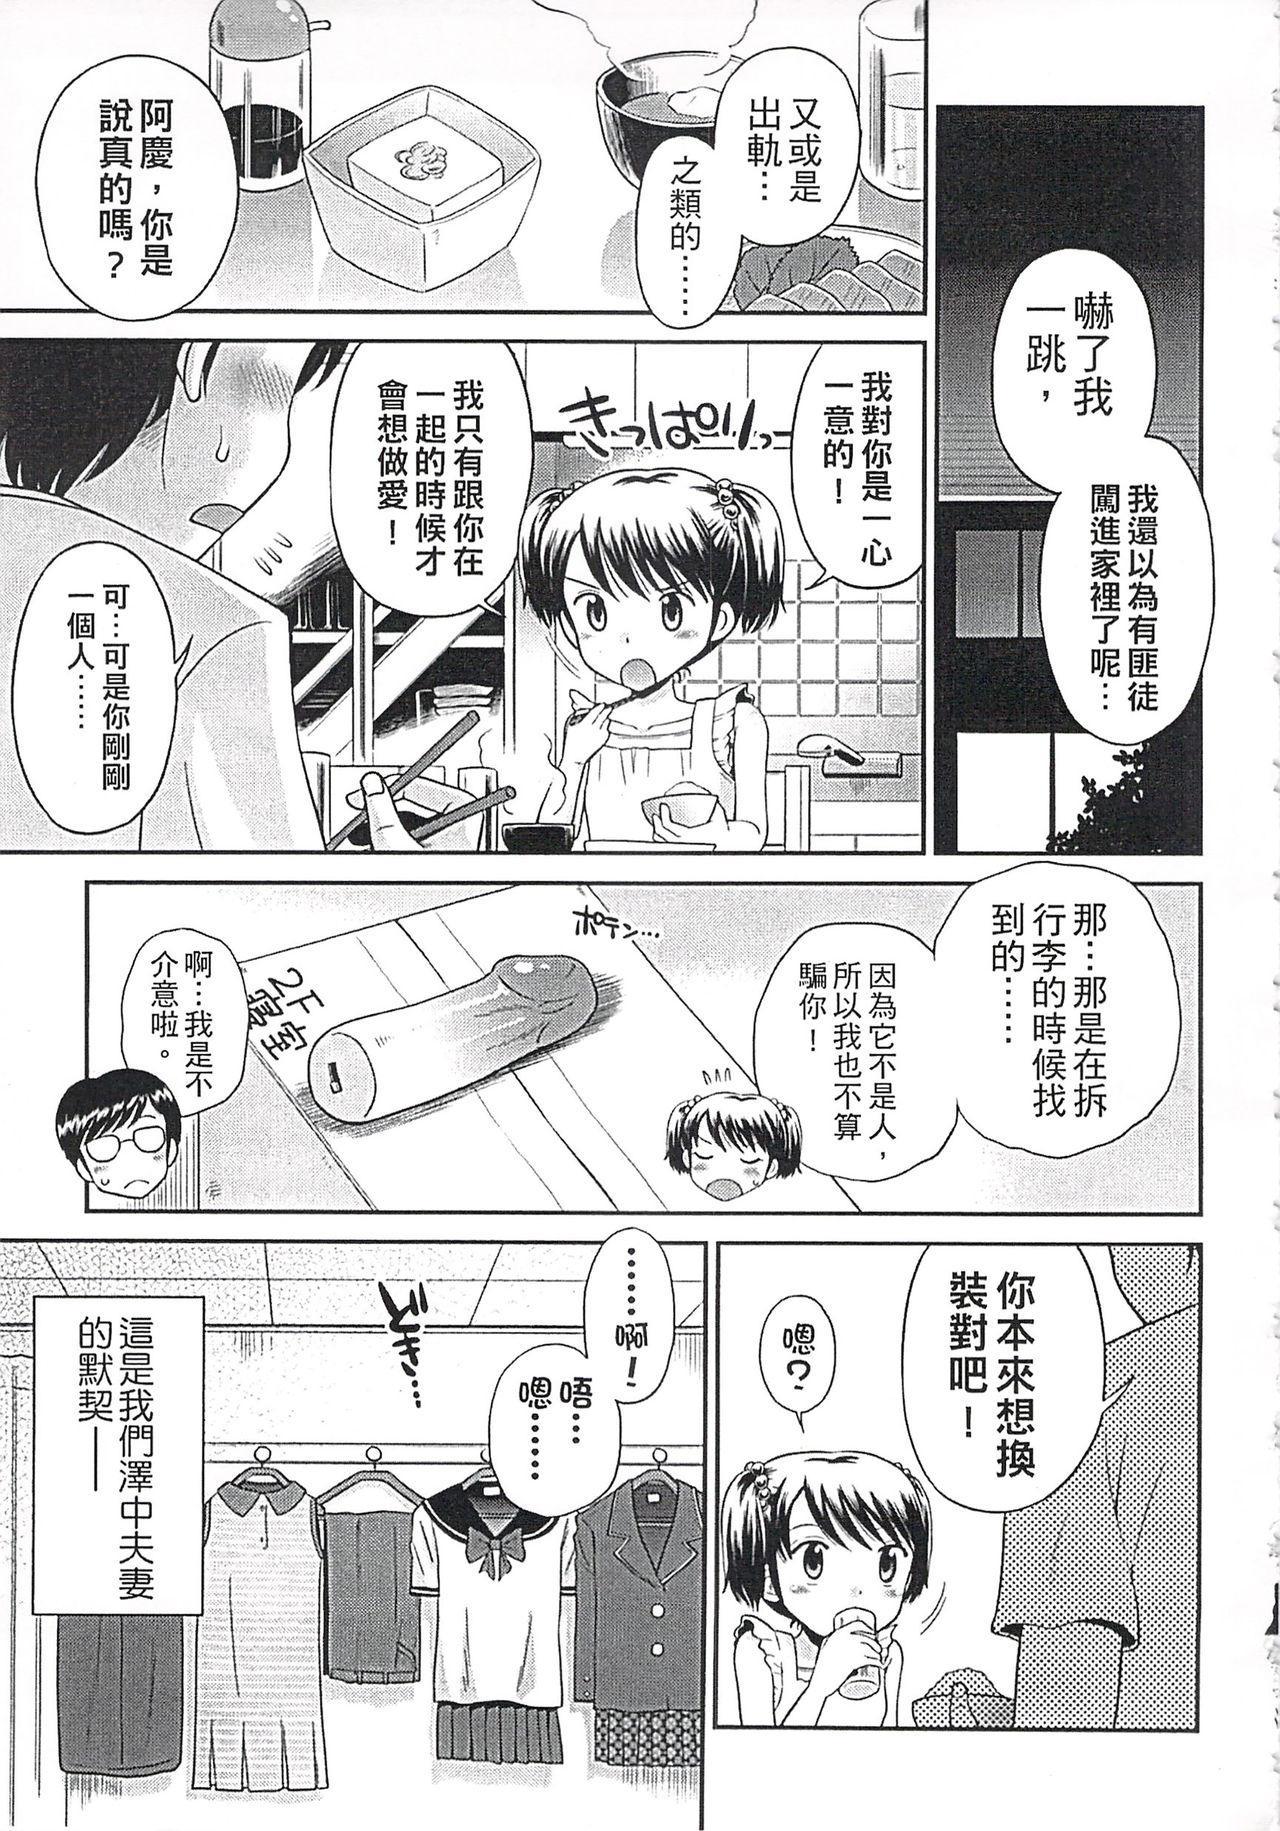 Kore demo Otona Desu Kedo!? Mrs.LOLITA Kanzenban   人家是大人啦! ~Mrs.LOLITA完全版 136